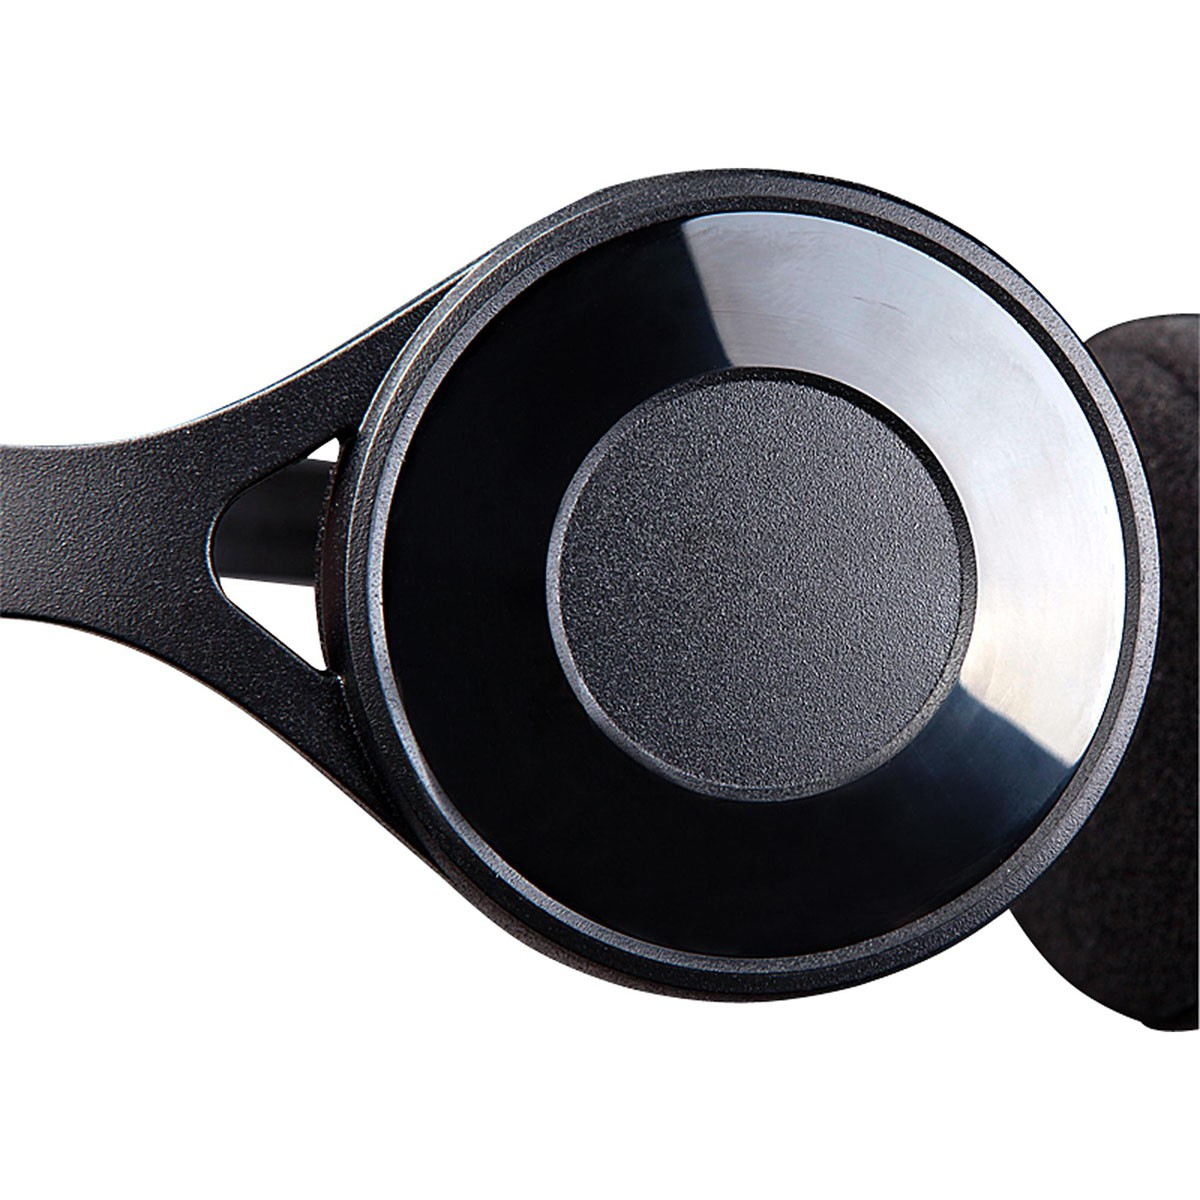 Edifier K550 Fone com Microfone, Headset, Preto